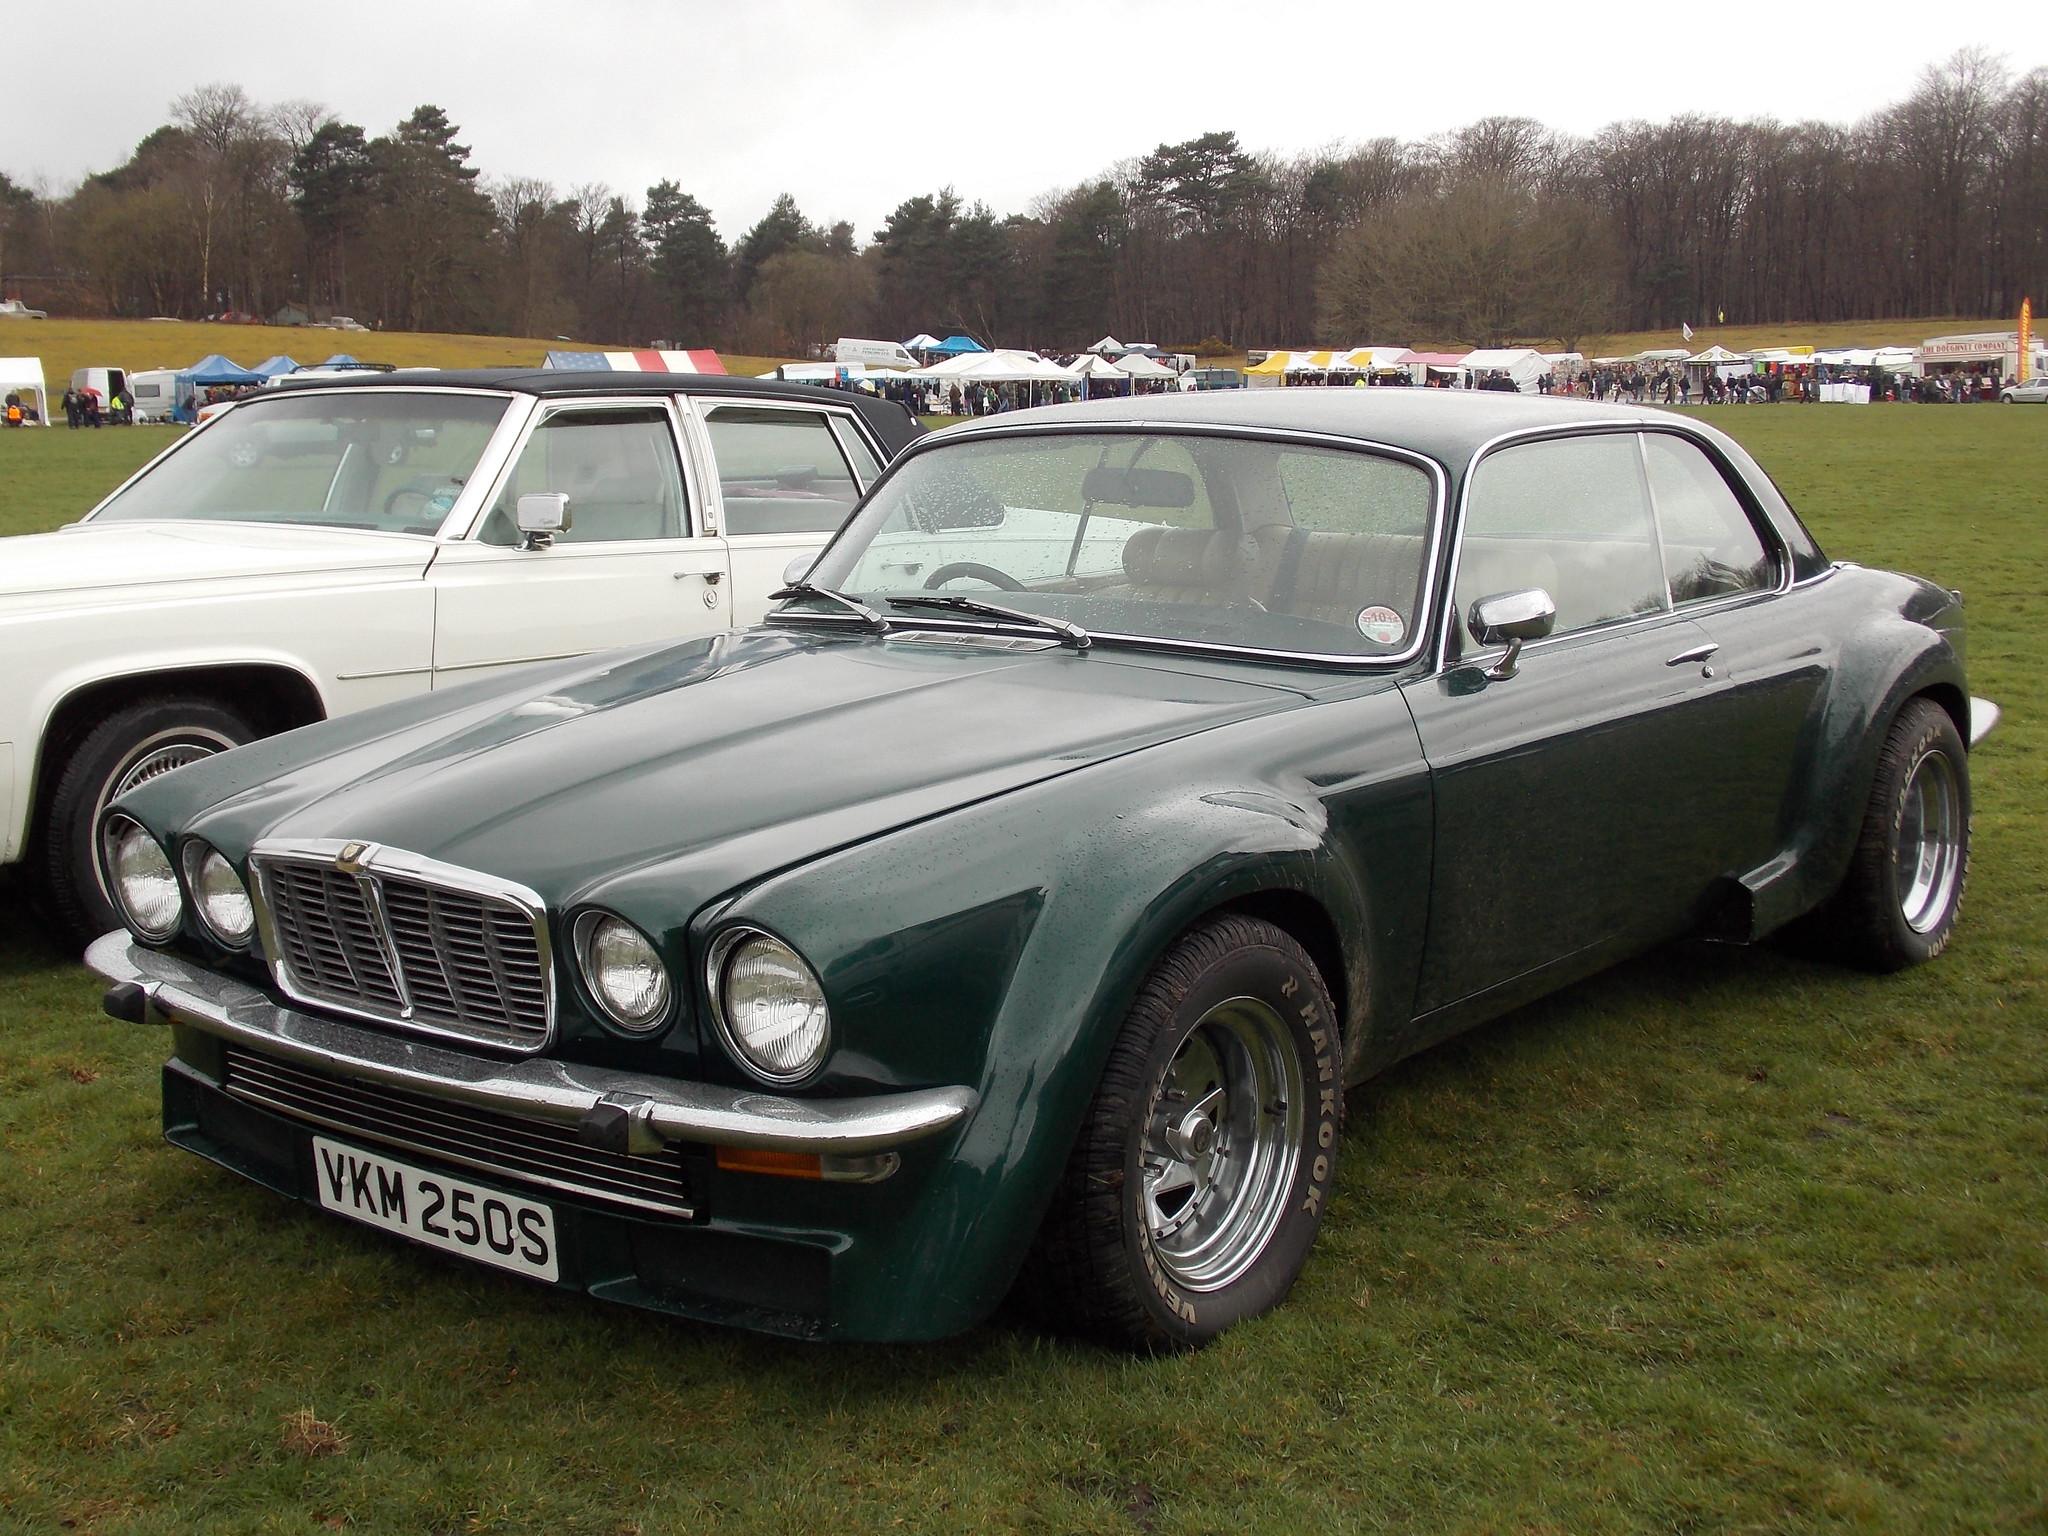 Steed s 1977 broadspeed jaguar xj12 series ii coup 233 the